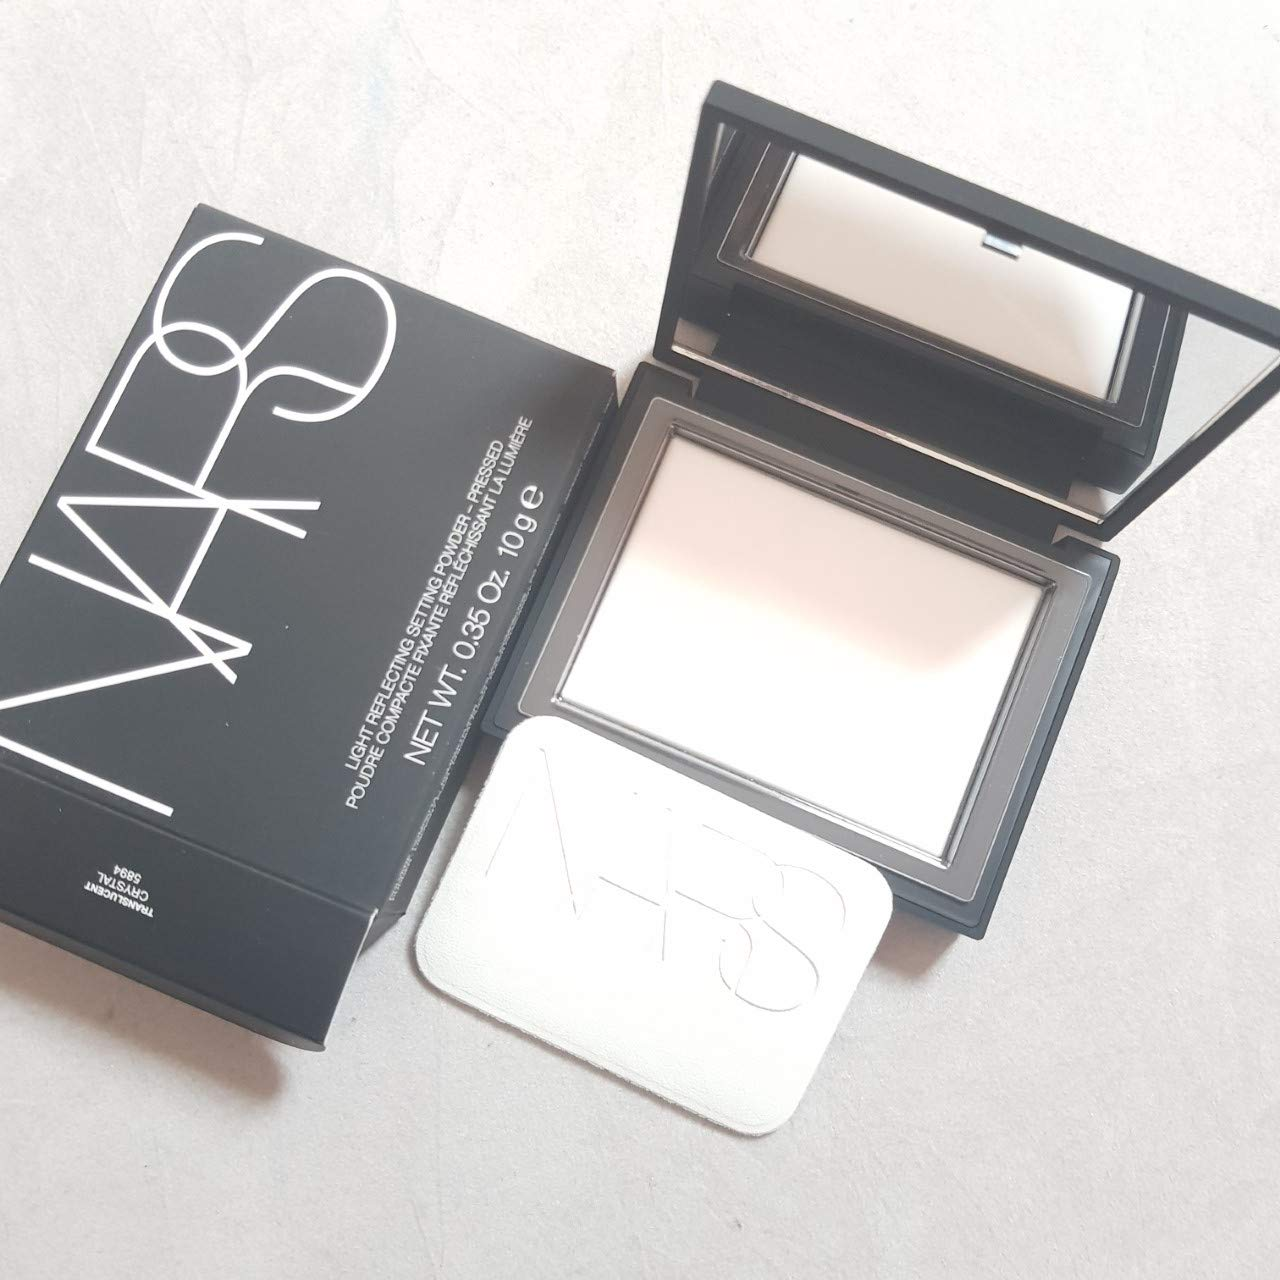 NARS Translucent Crystal Light Reflecting Setting Powder